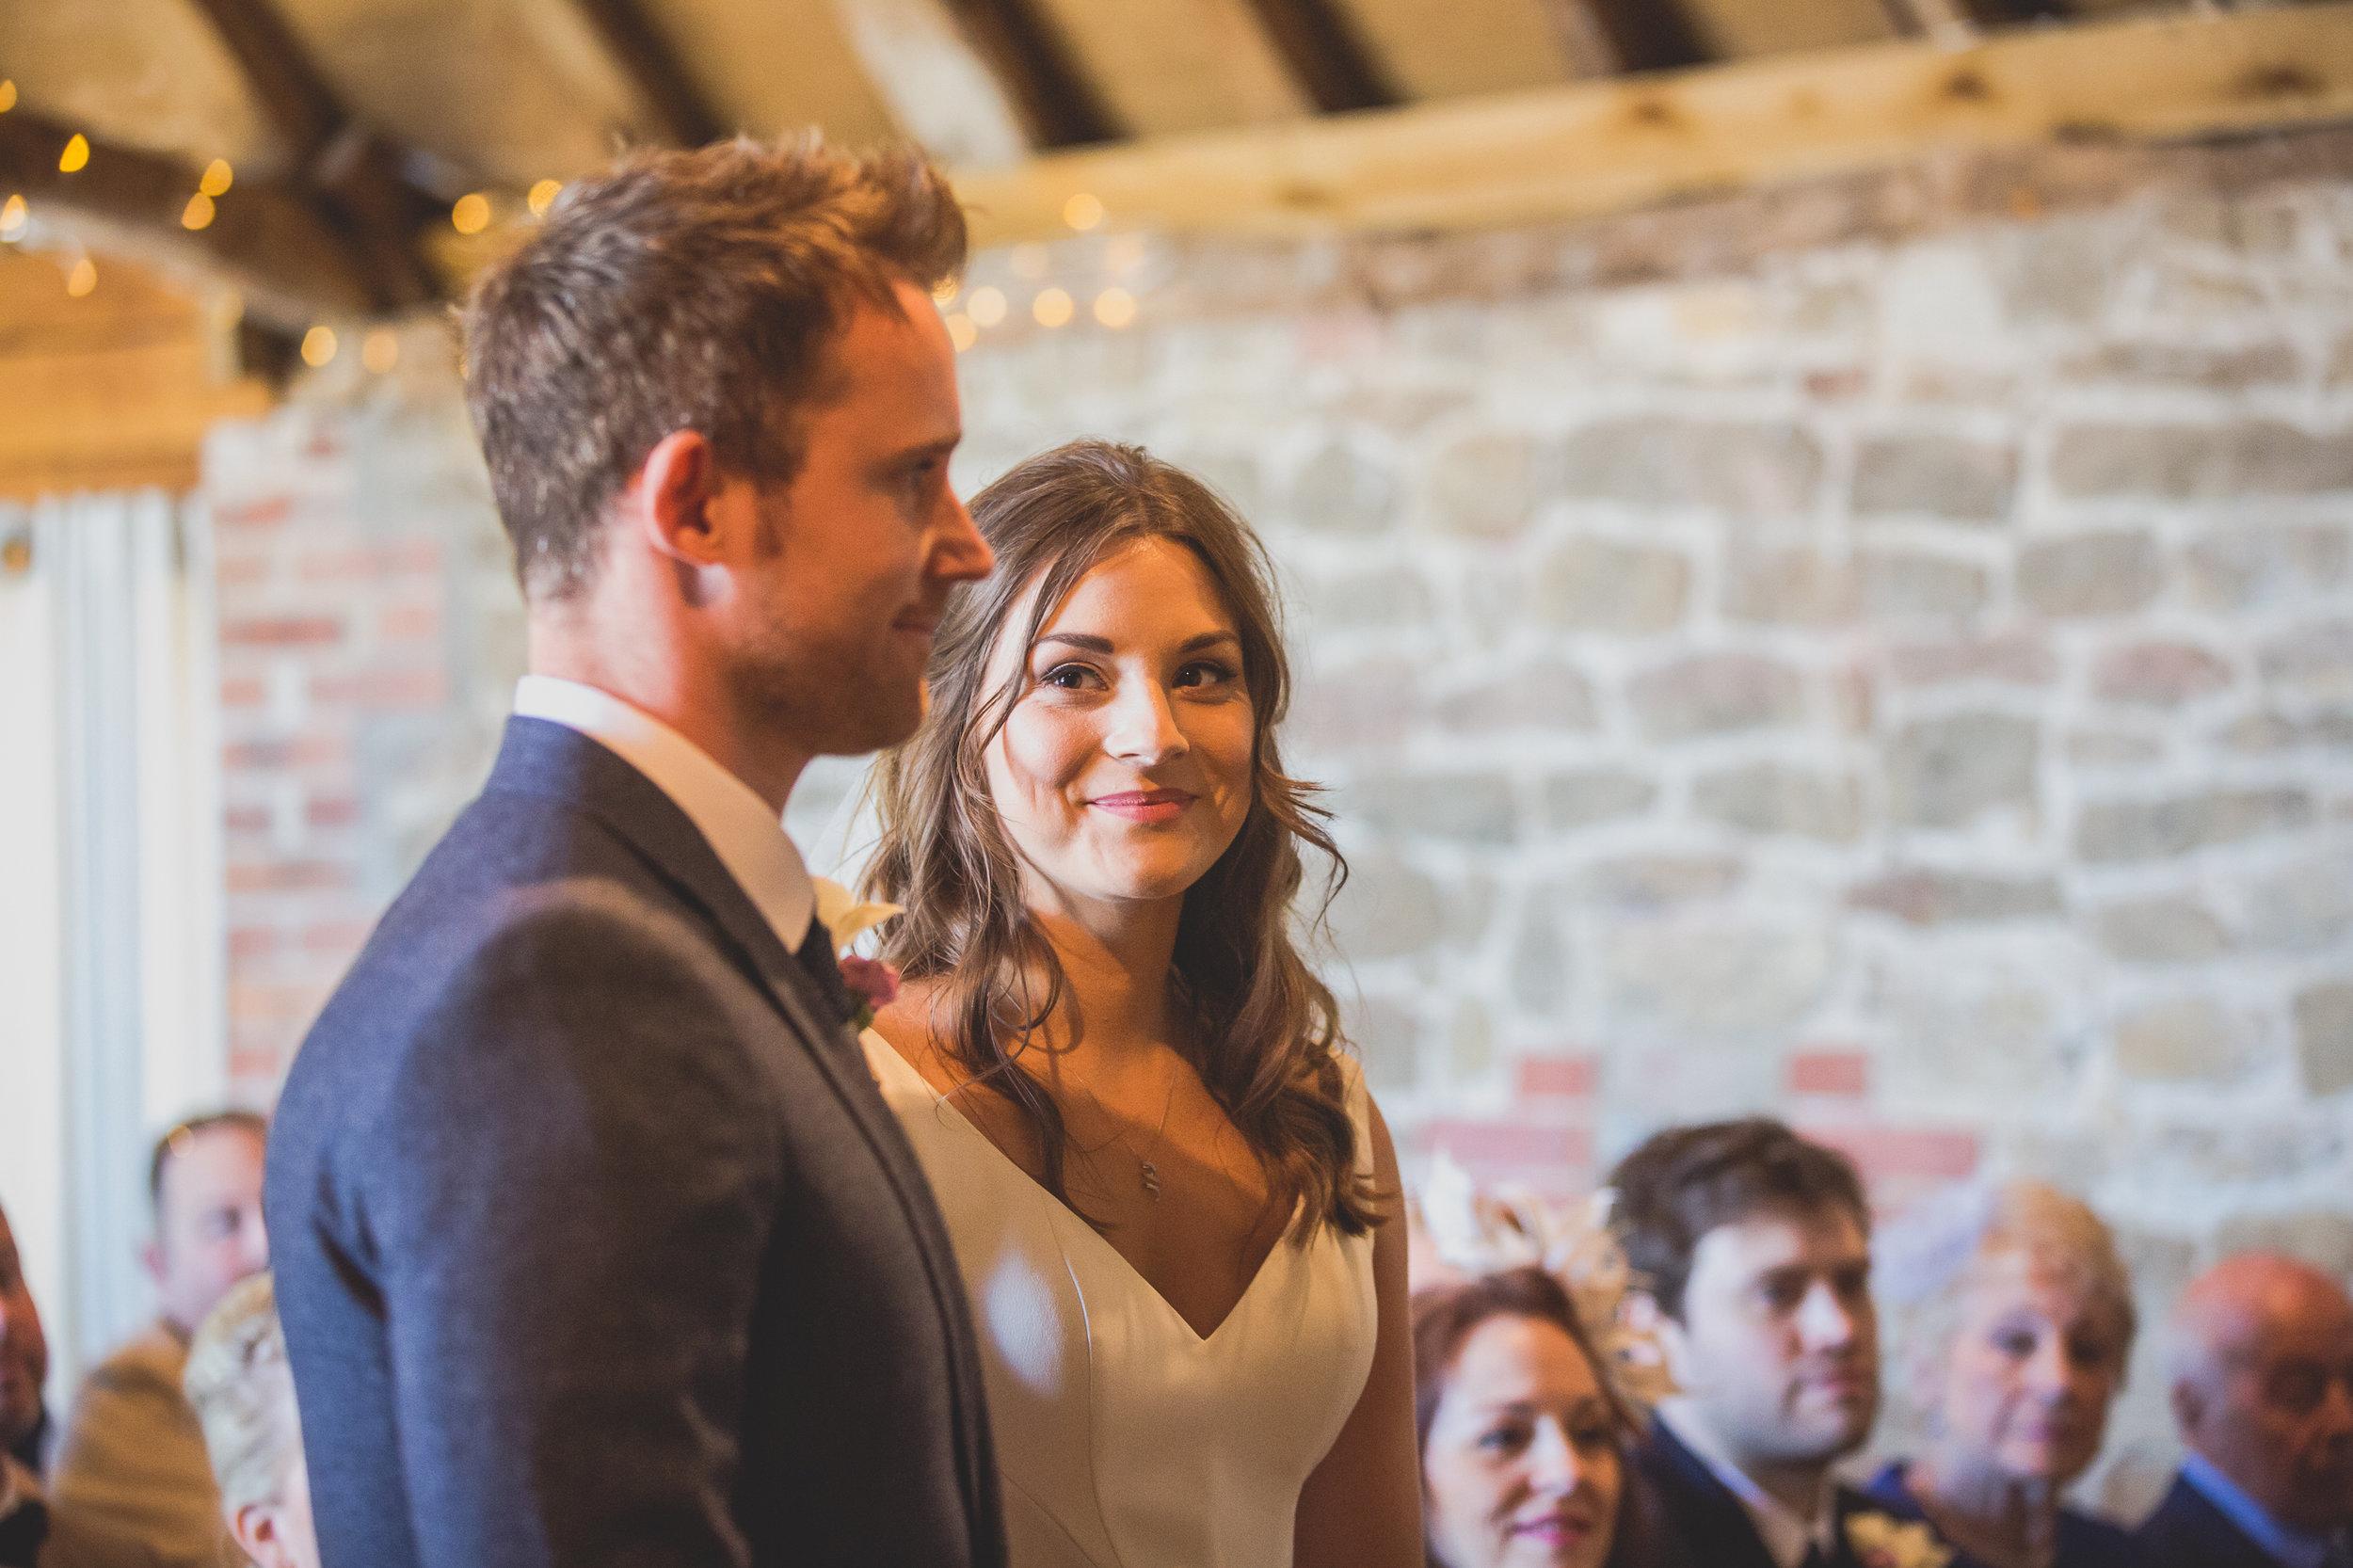 Grittenham Barn female wedding photographers west sussex petworth social-53.jpg